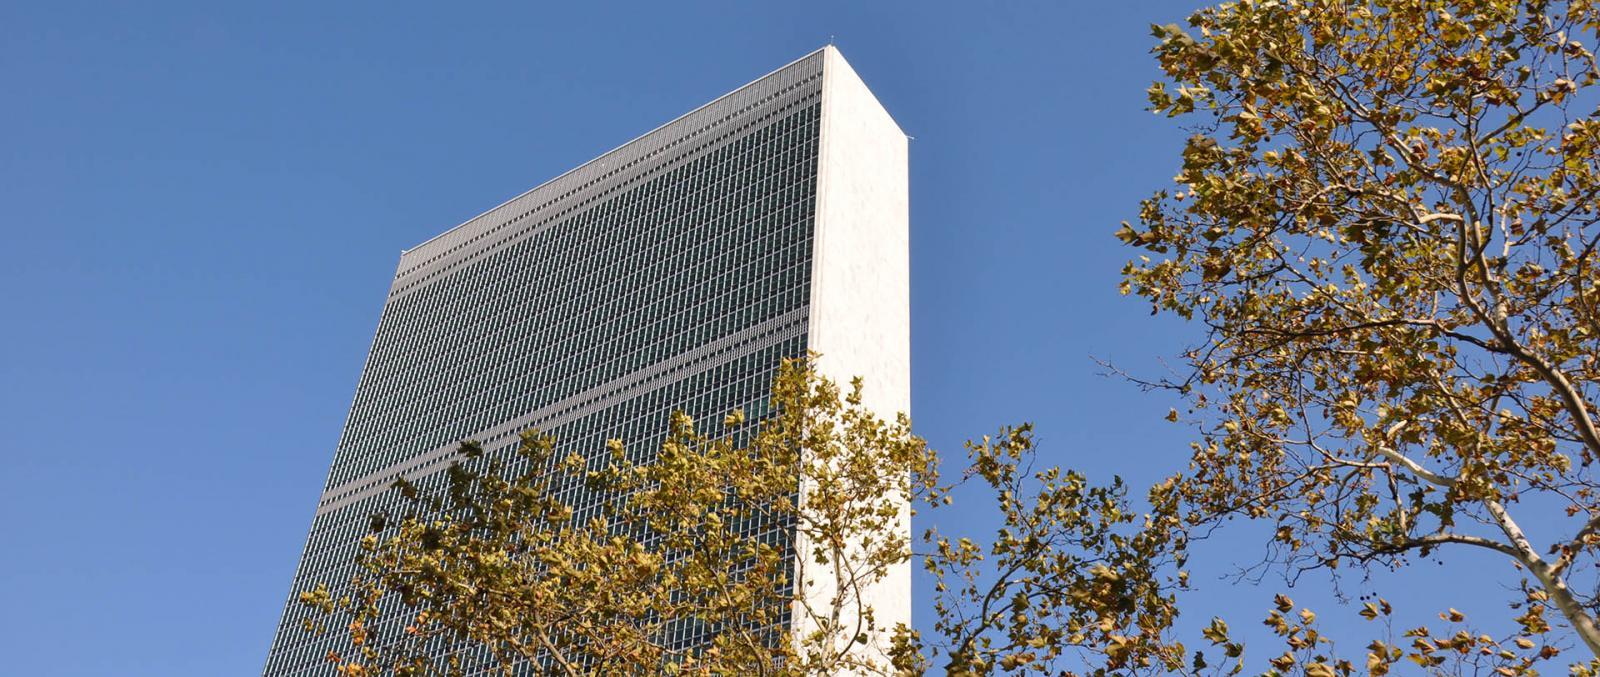 United Nations Headquarter am East River